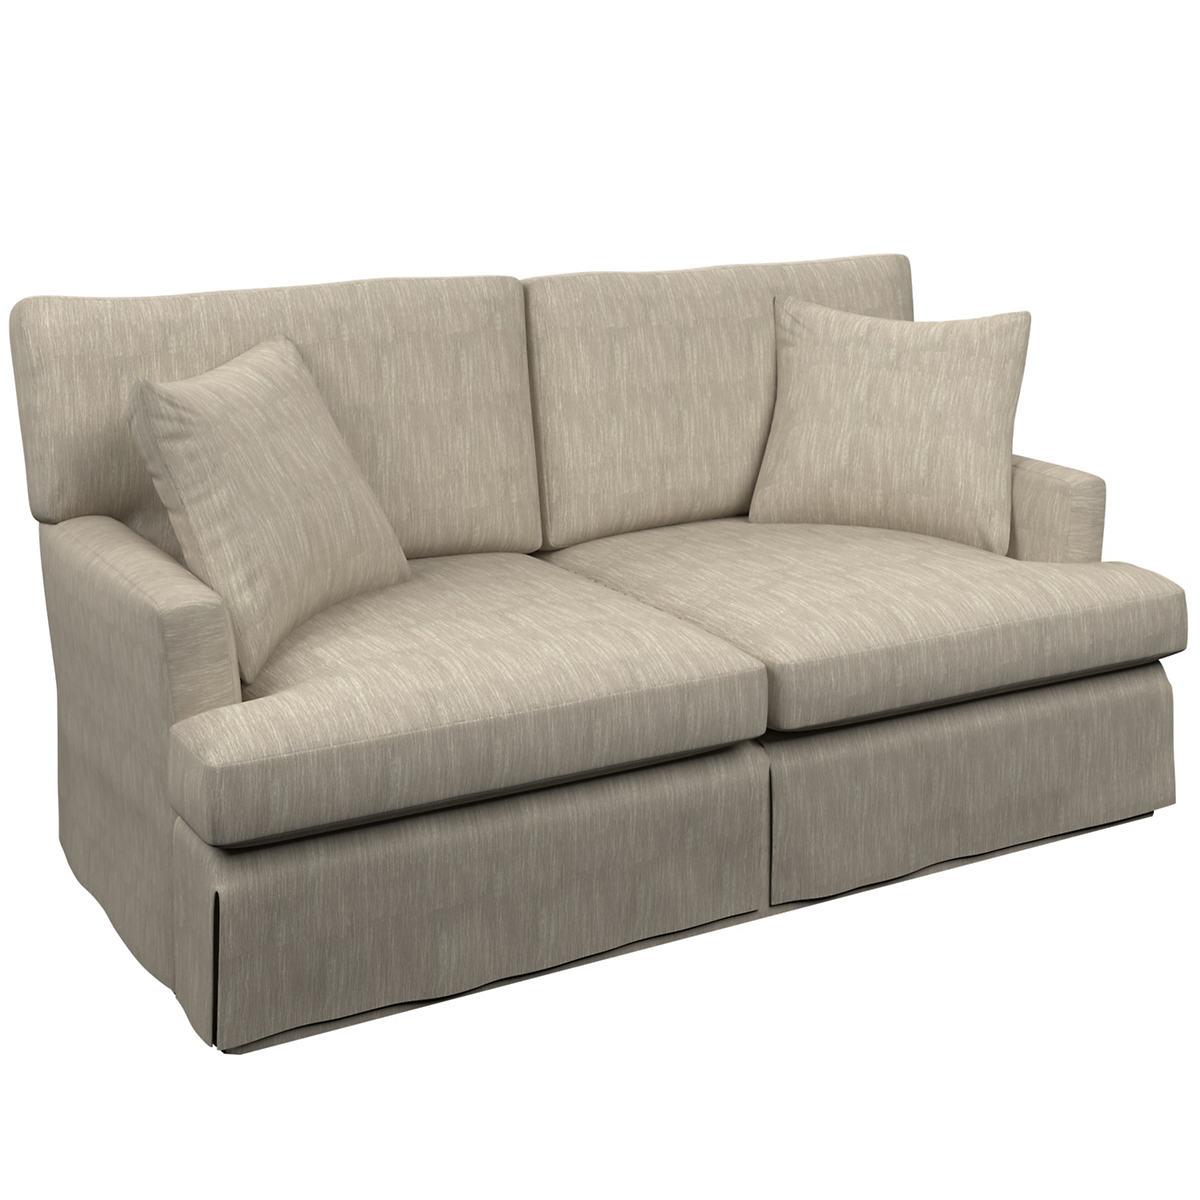 Graduate Linen Saybrook 2 Seater Slipcovered Sofa